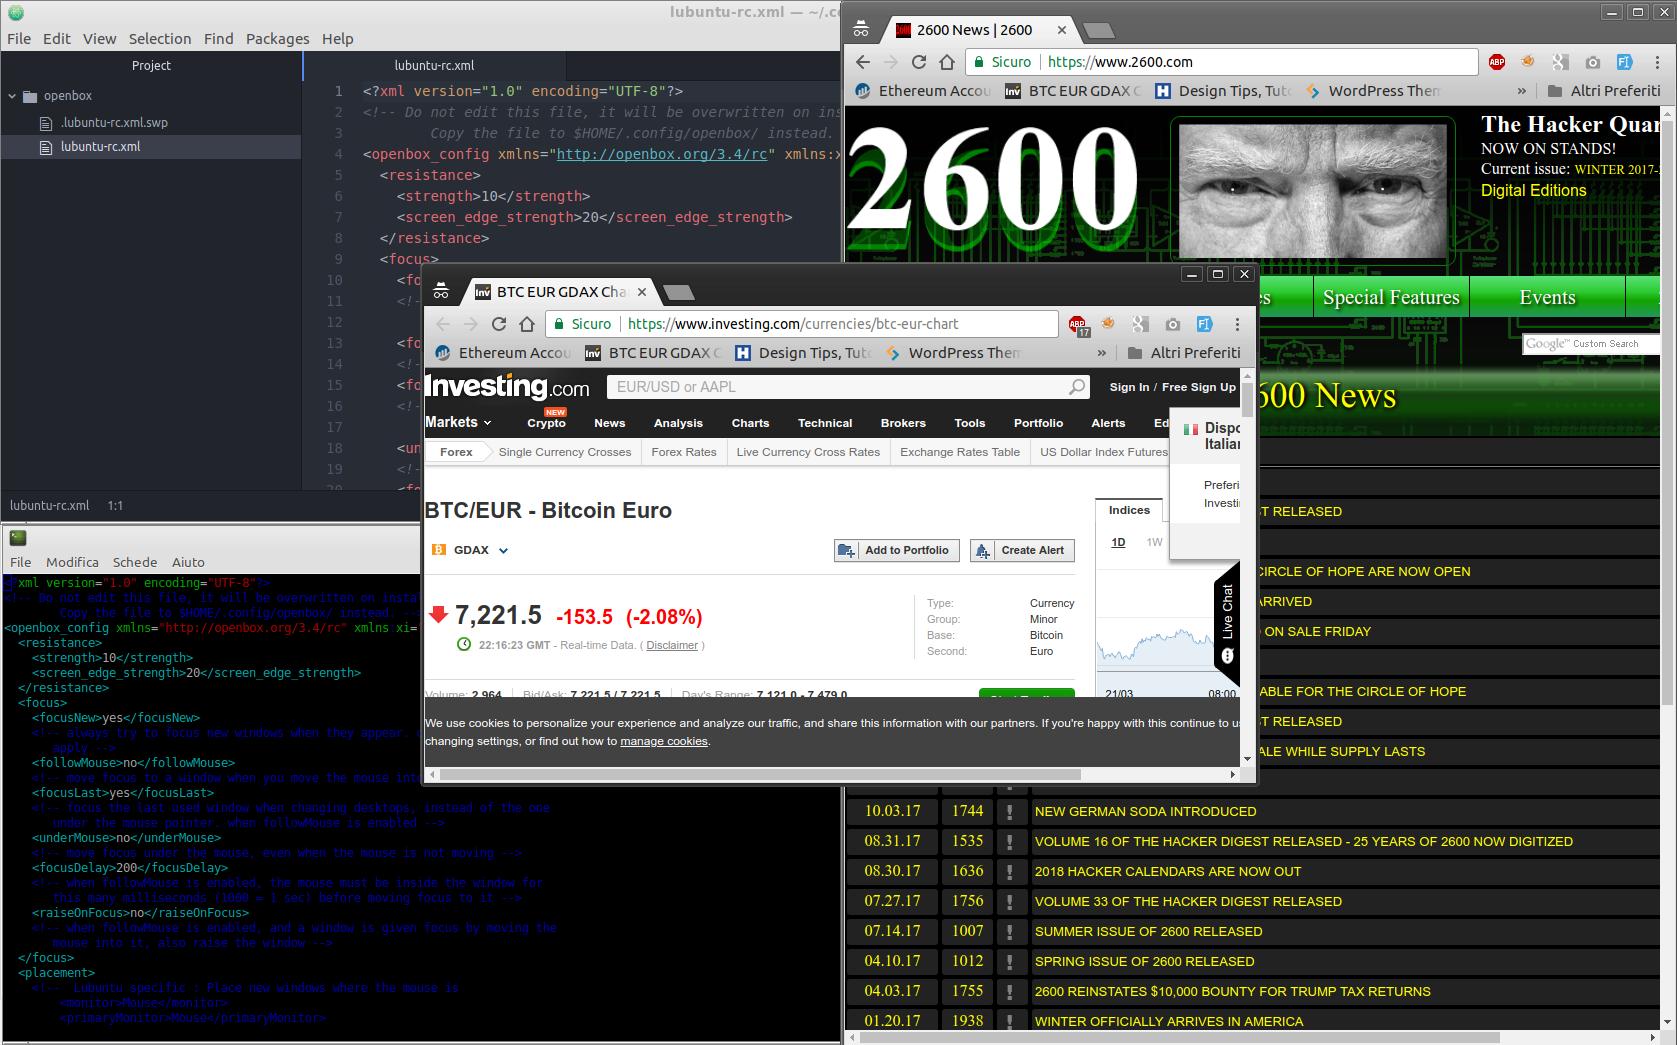 HOWTO: [resize, split, windows, LXDE, Lubuntu, Openbox] How to